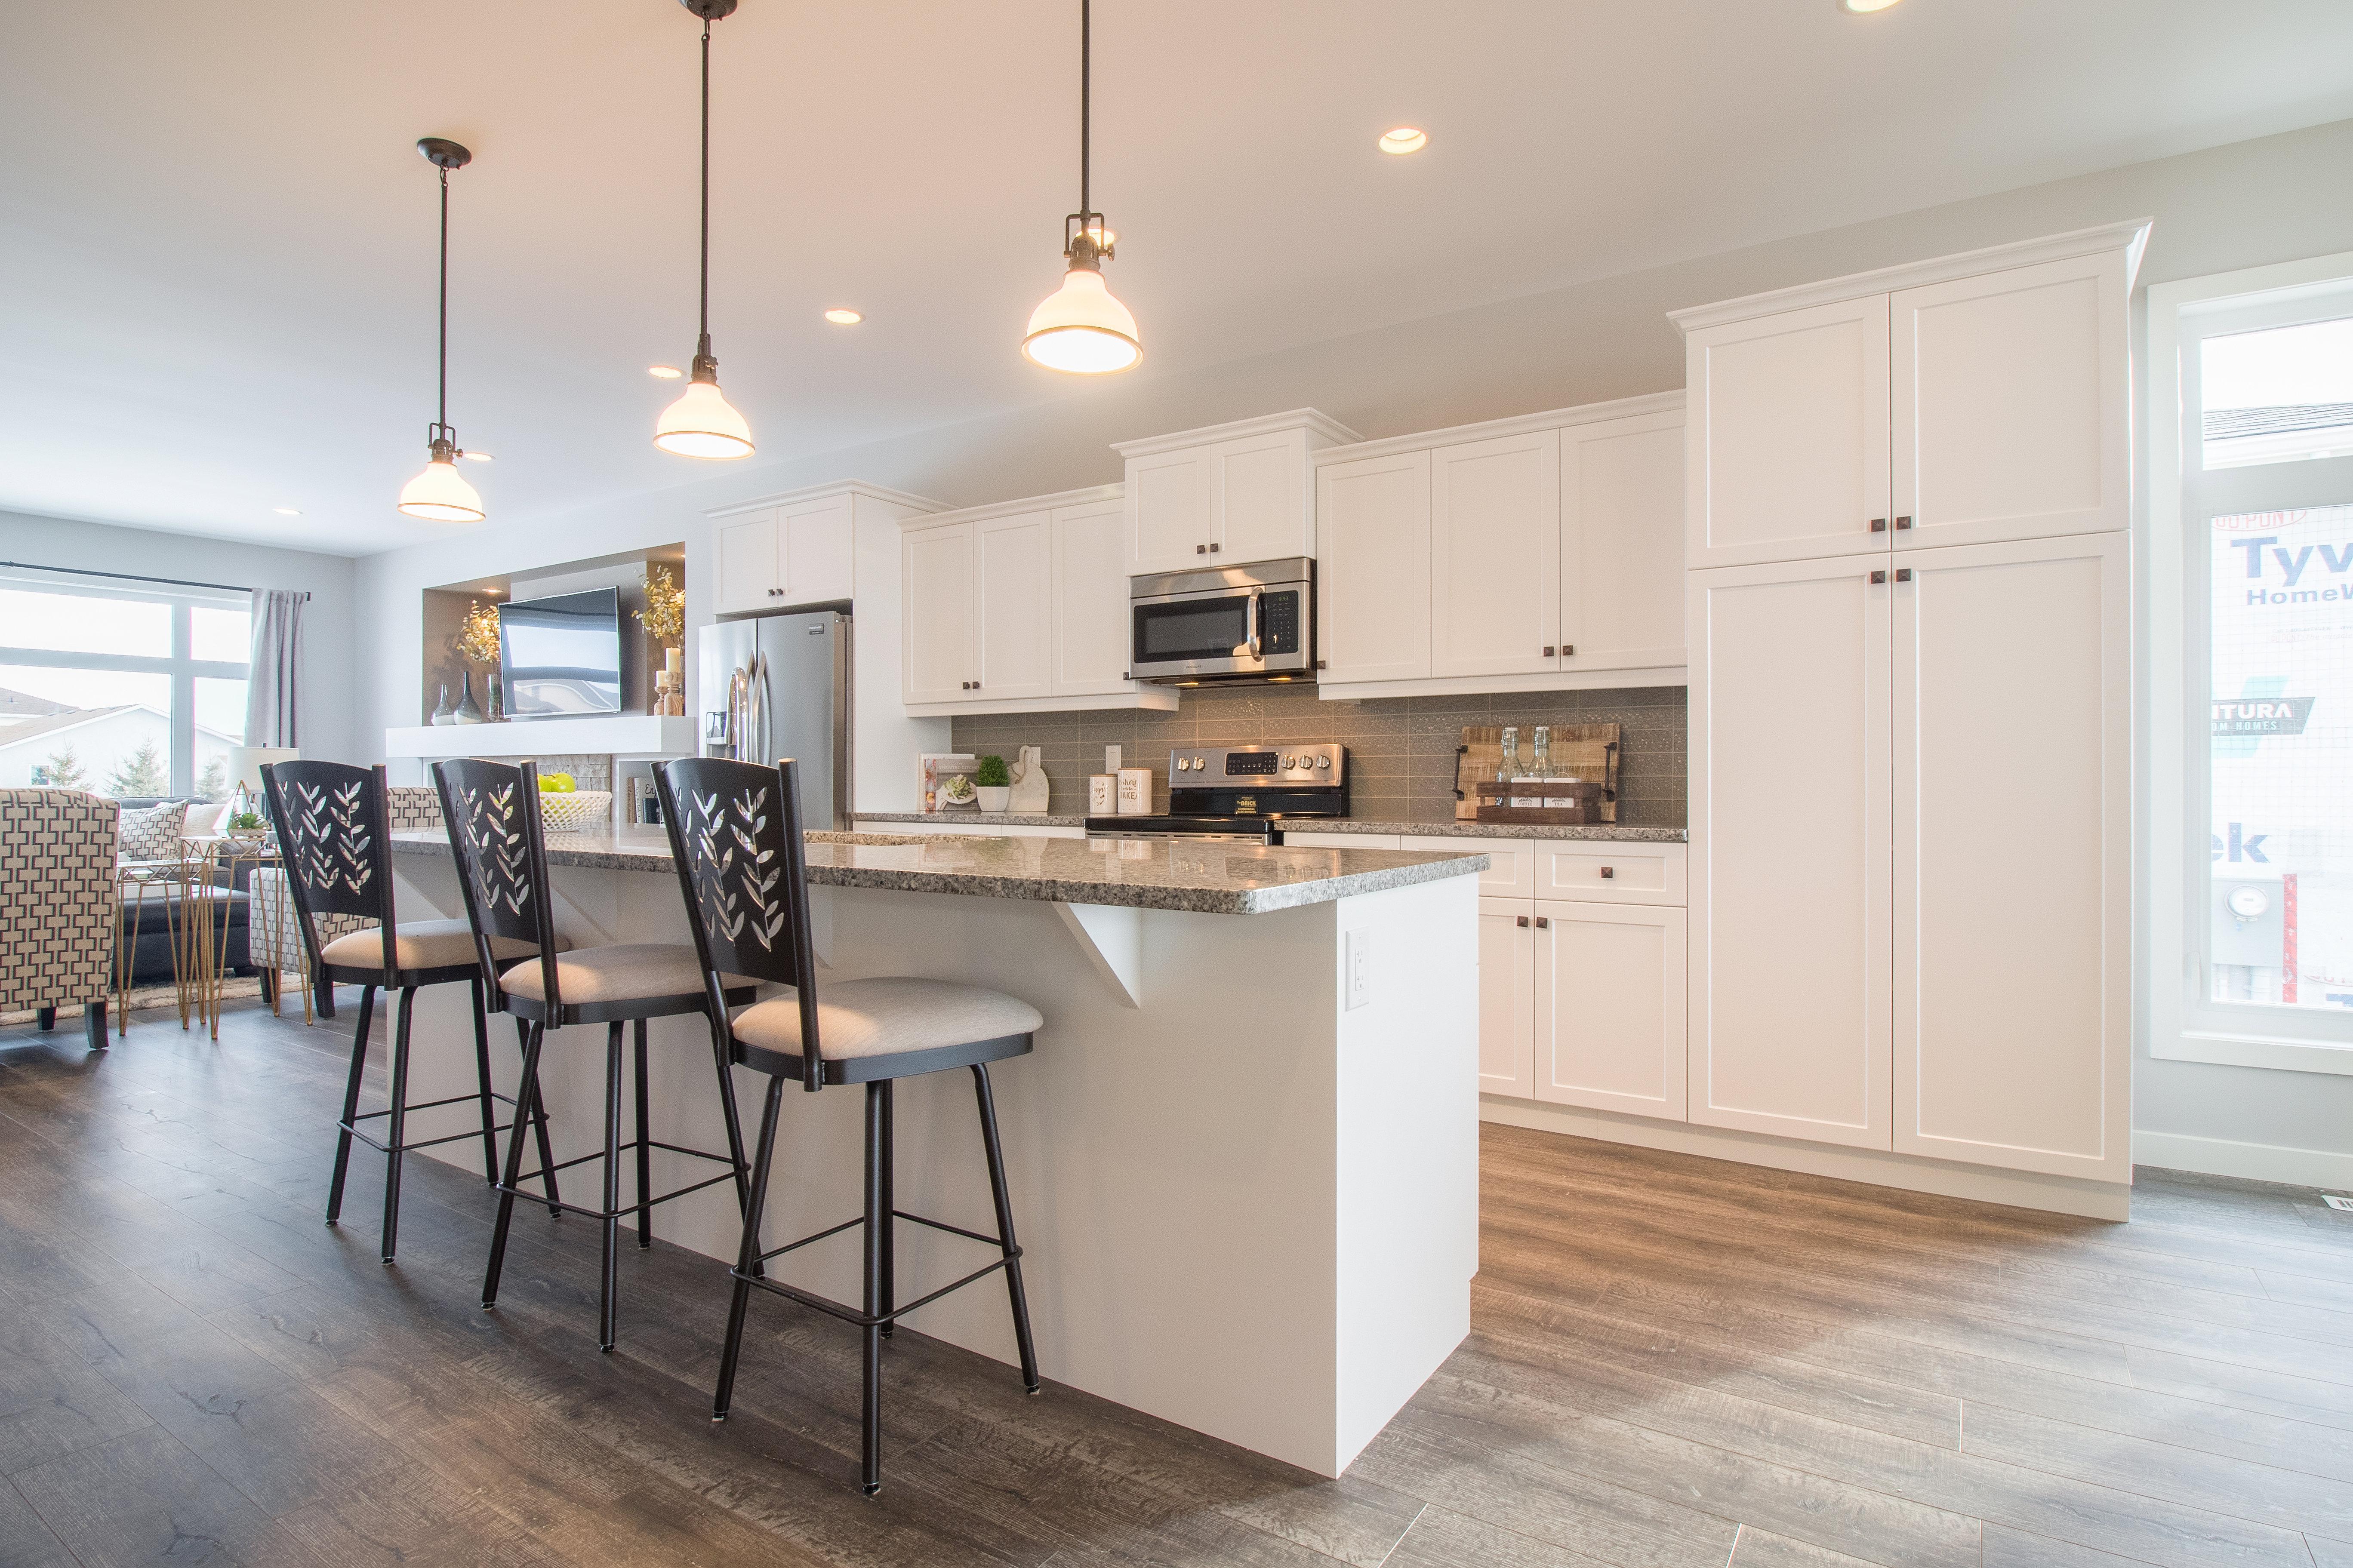 Mosaik Designs Winnipeg Real Estate Photography Videography - Kitchen design winnipeg